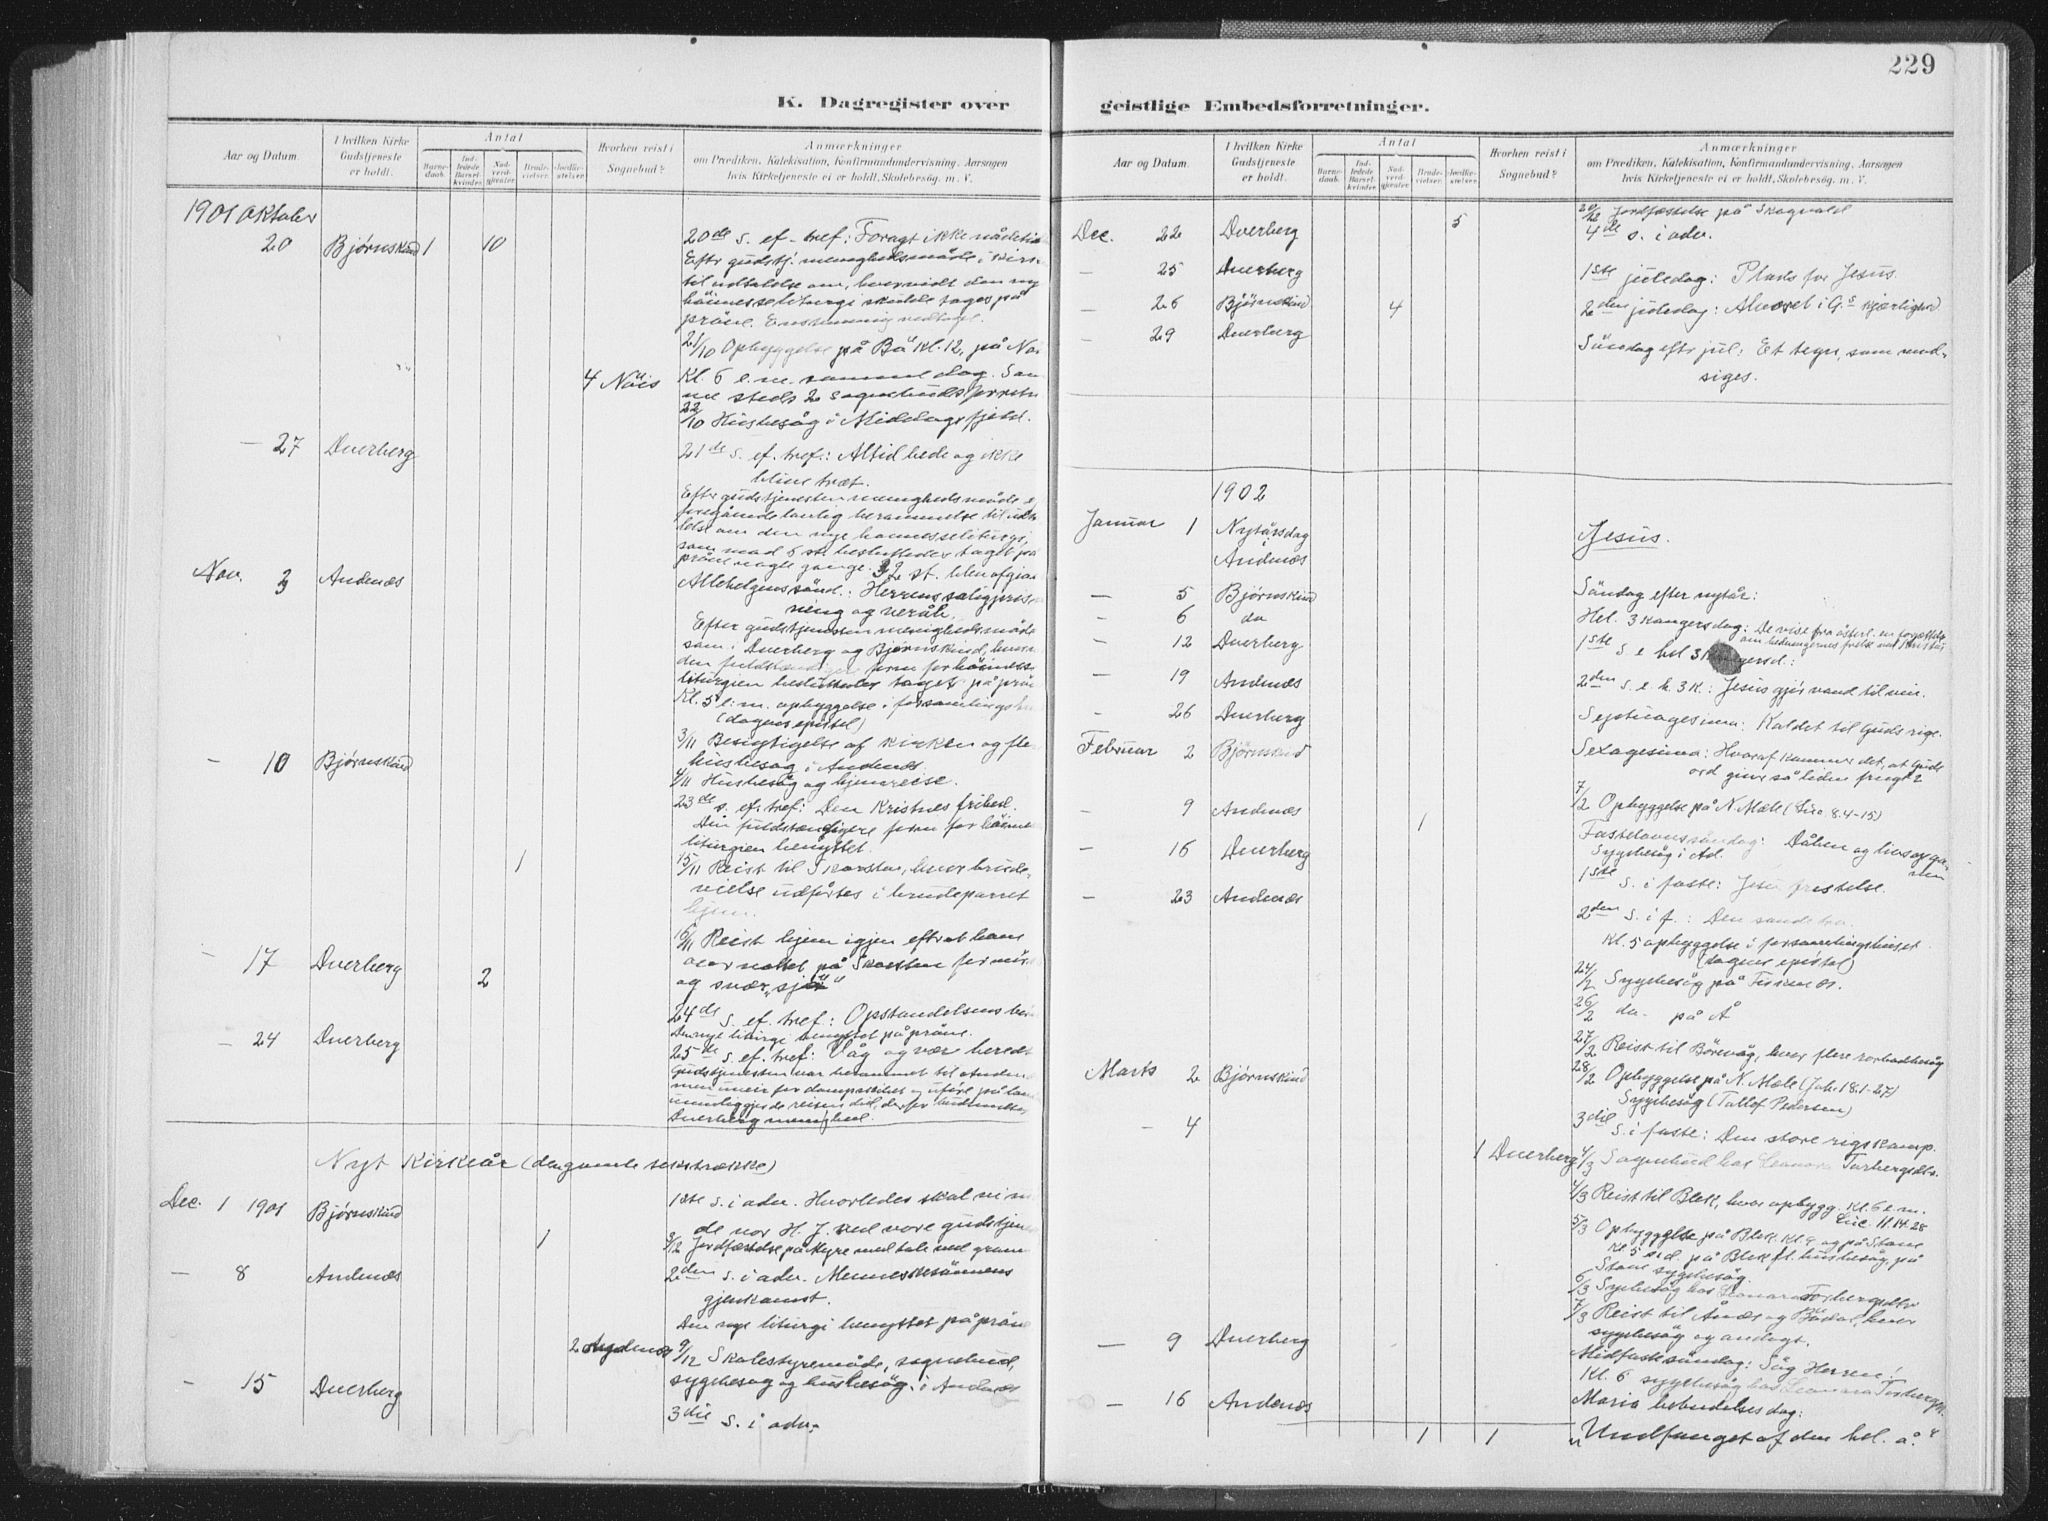 SAT, Ministerialprotokoller, klokkerbøker og fødselsregistre - Nordland, 897/L1400: Ministerialbok nr. 897A07, 1897-1908, s. 229